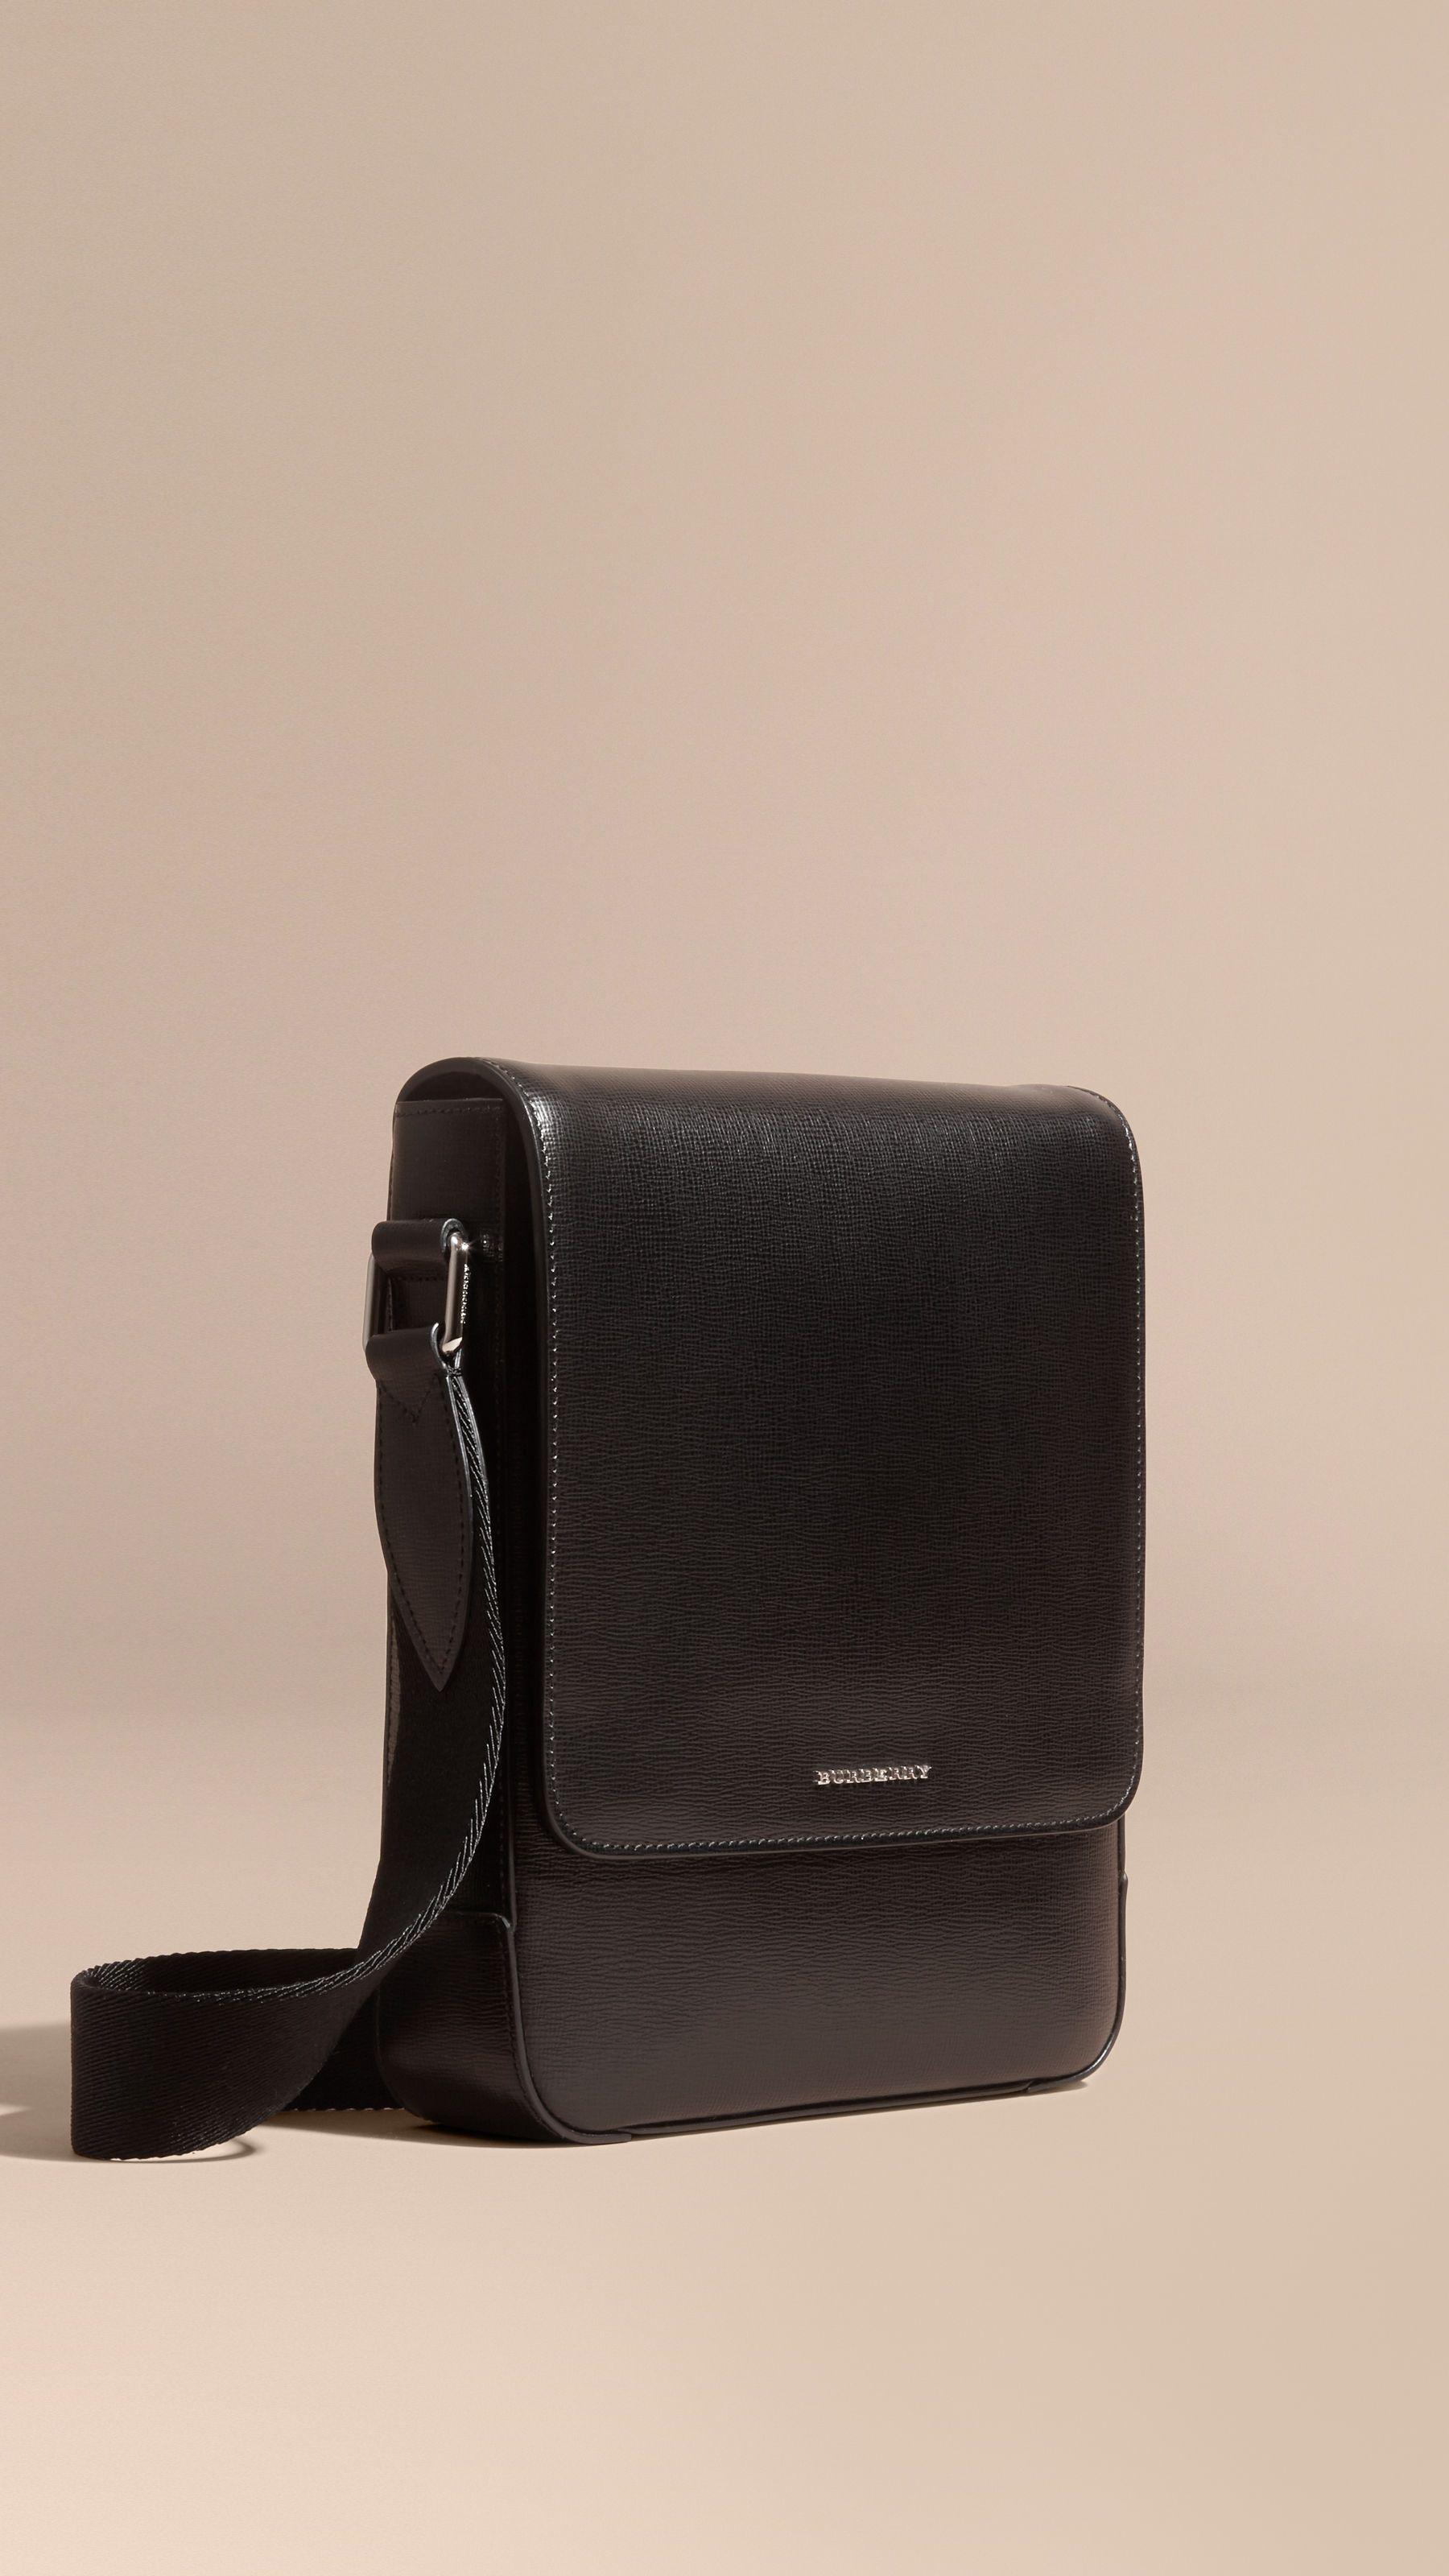 47a733402413 London Leather Crossbody Bag Black